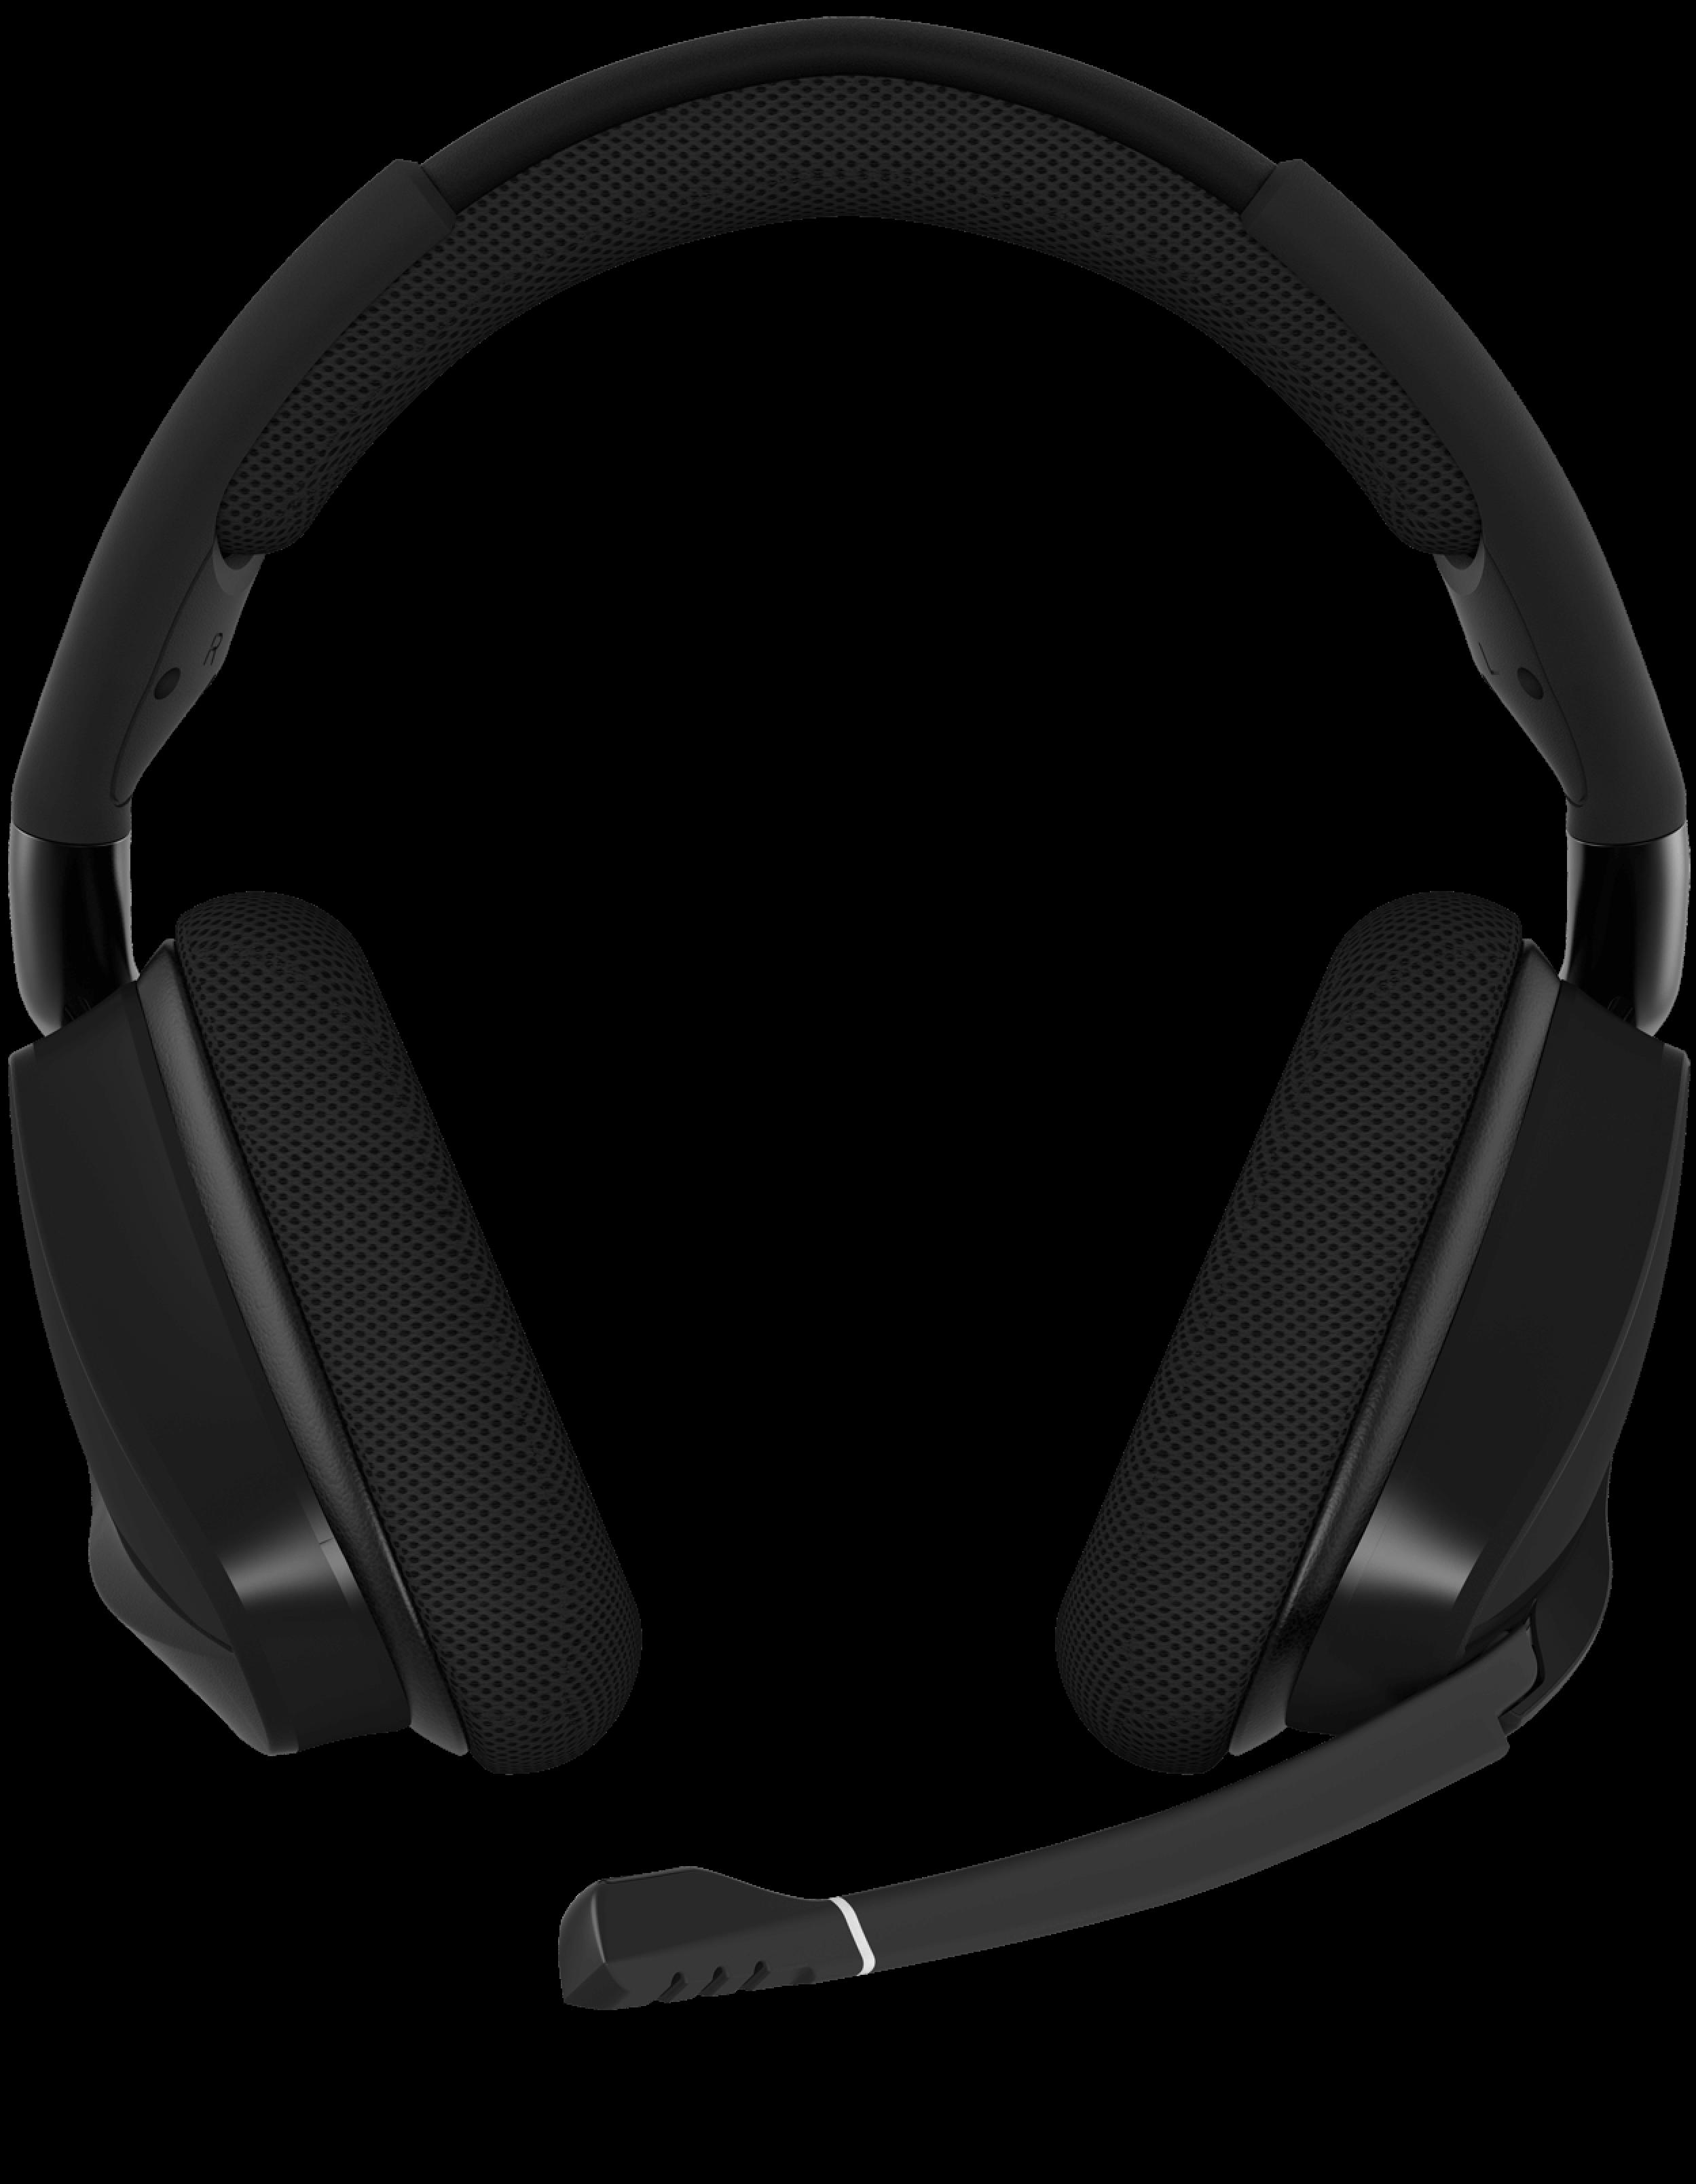 Gaming Headset Transparent